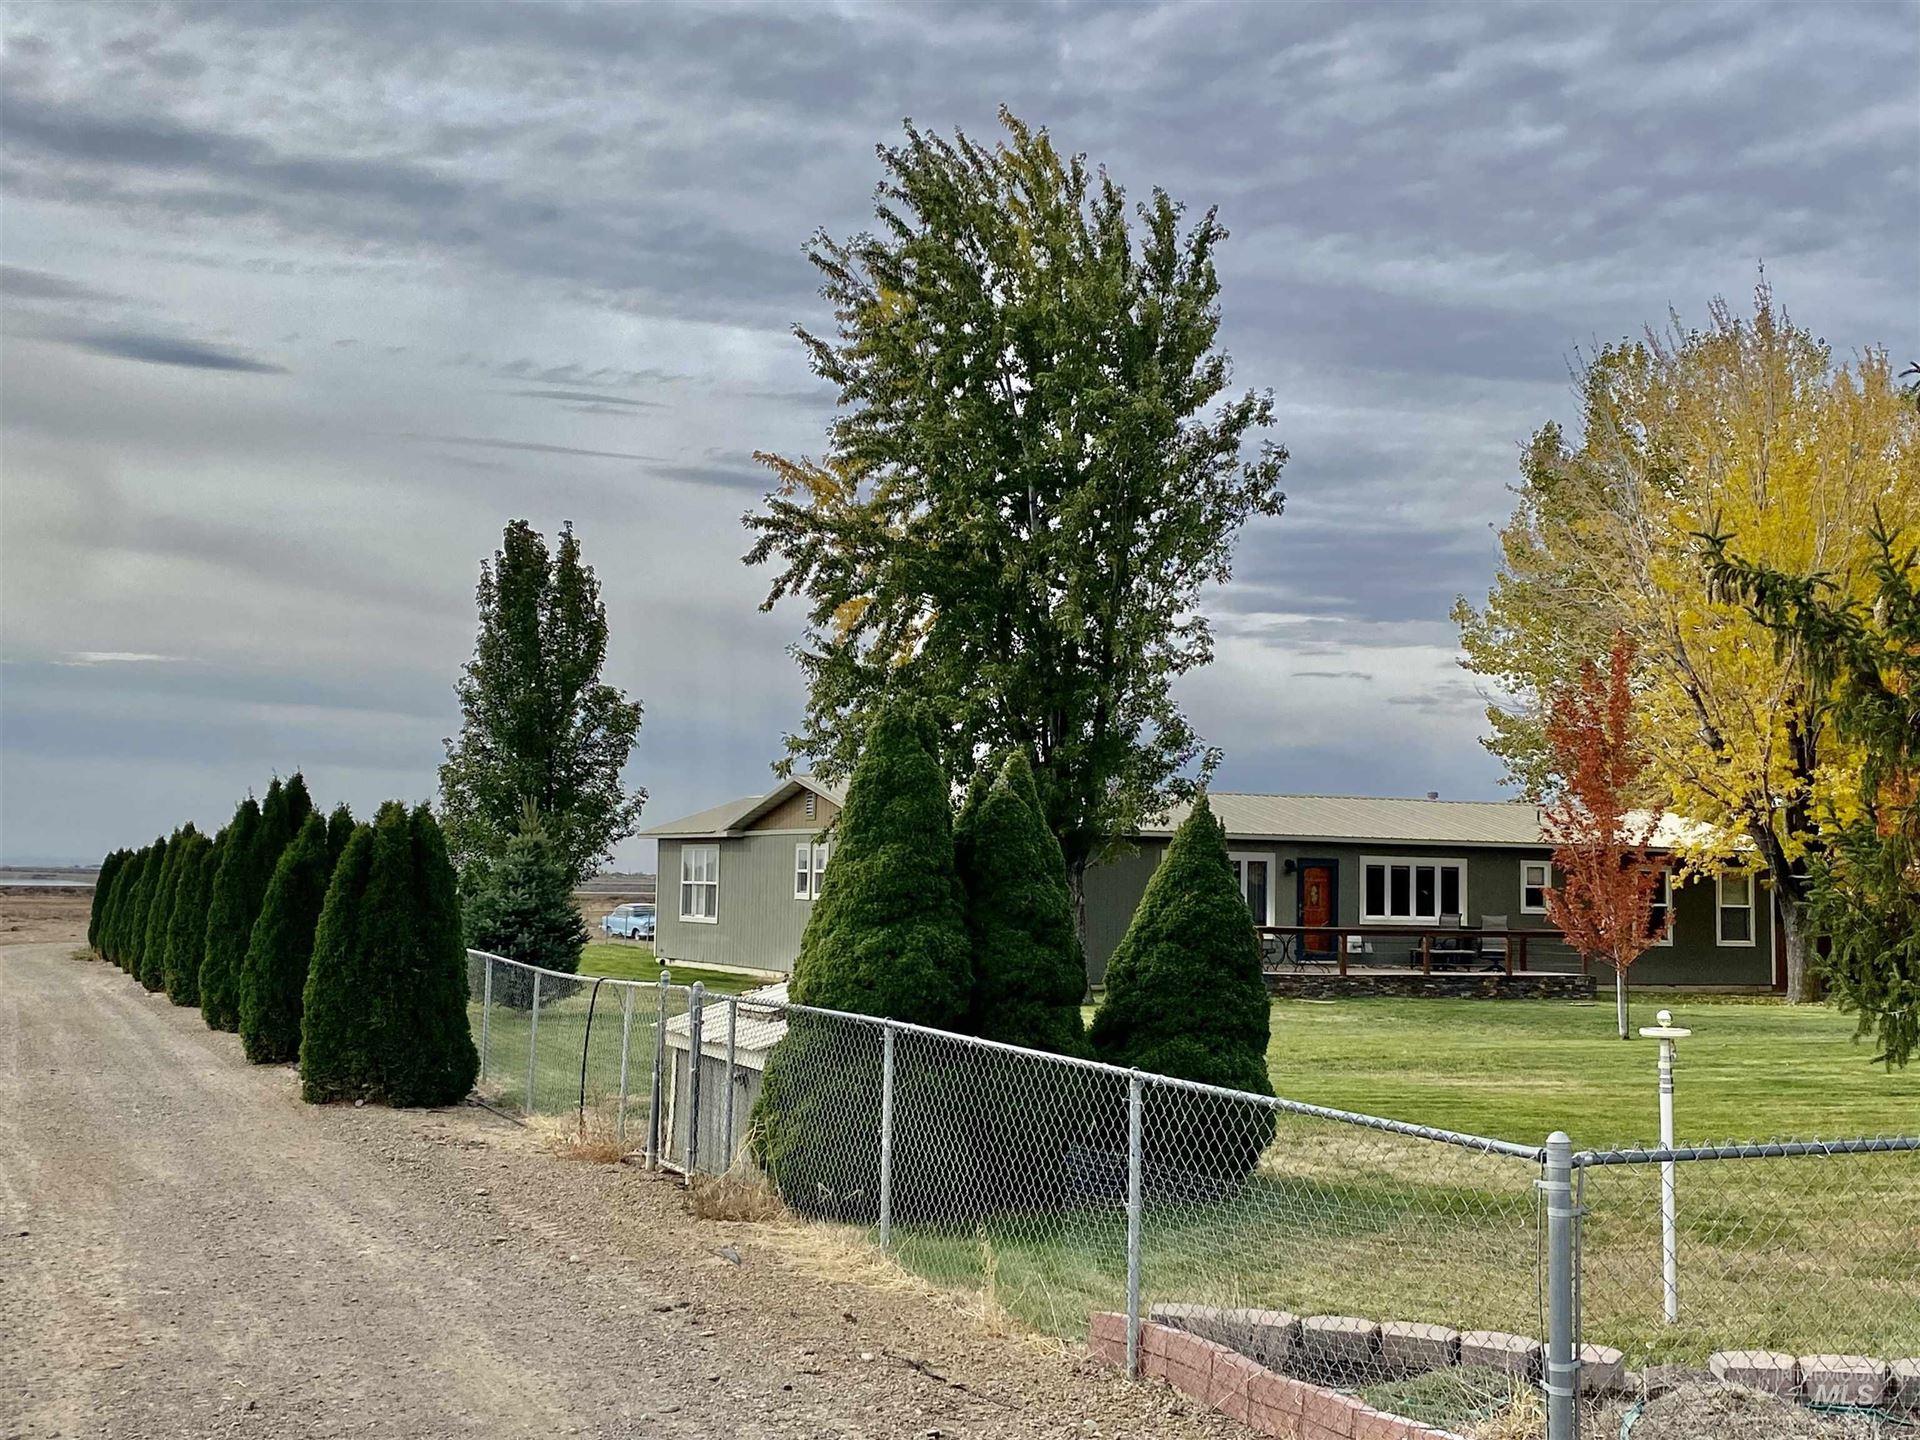 925 SW Vera, Mountain Home, ID 83647 - MLS#: 98822853